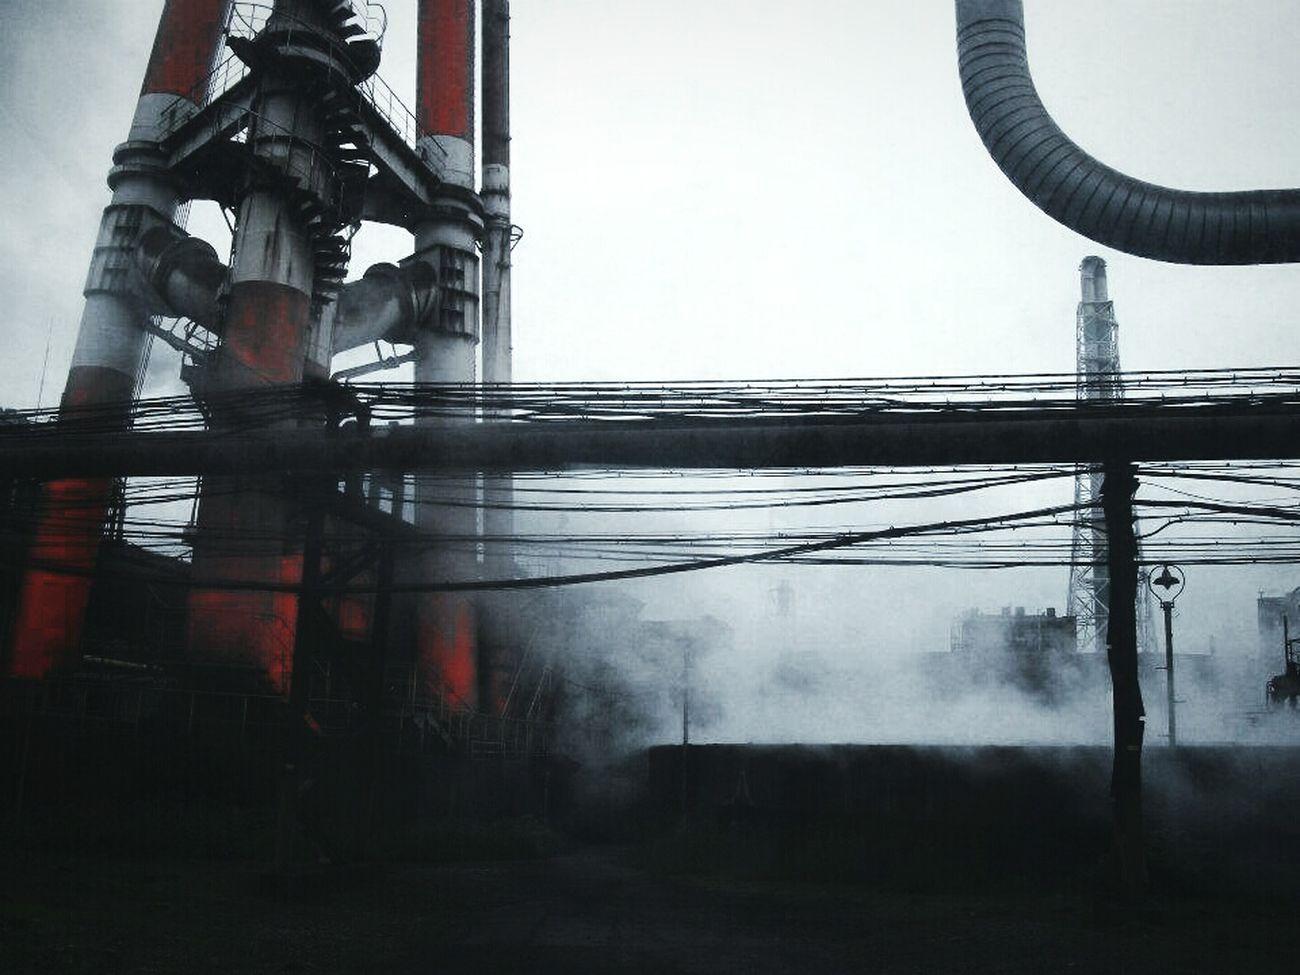 Where steampunk tales begin... Steampunk Steel Factory Japan KYUSHU Random Shots Factory